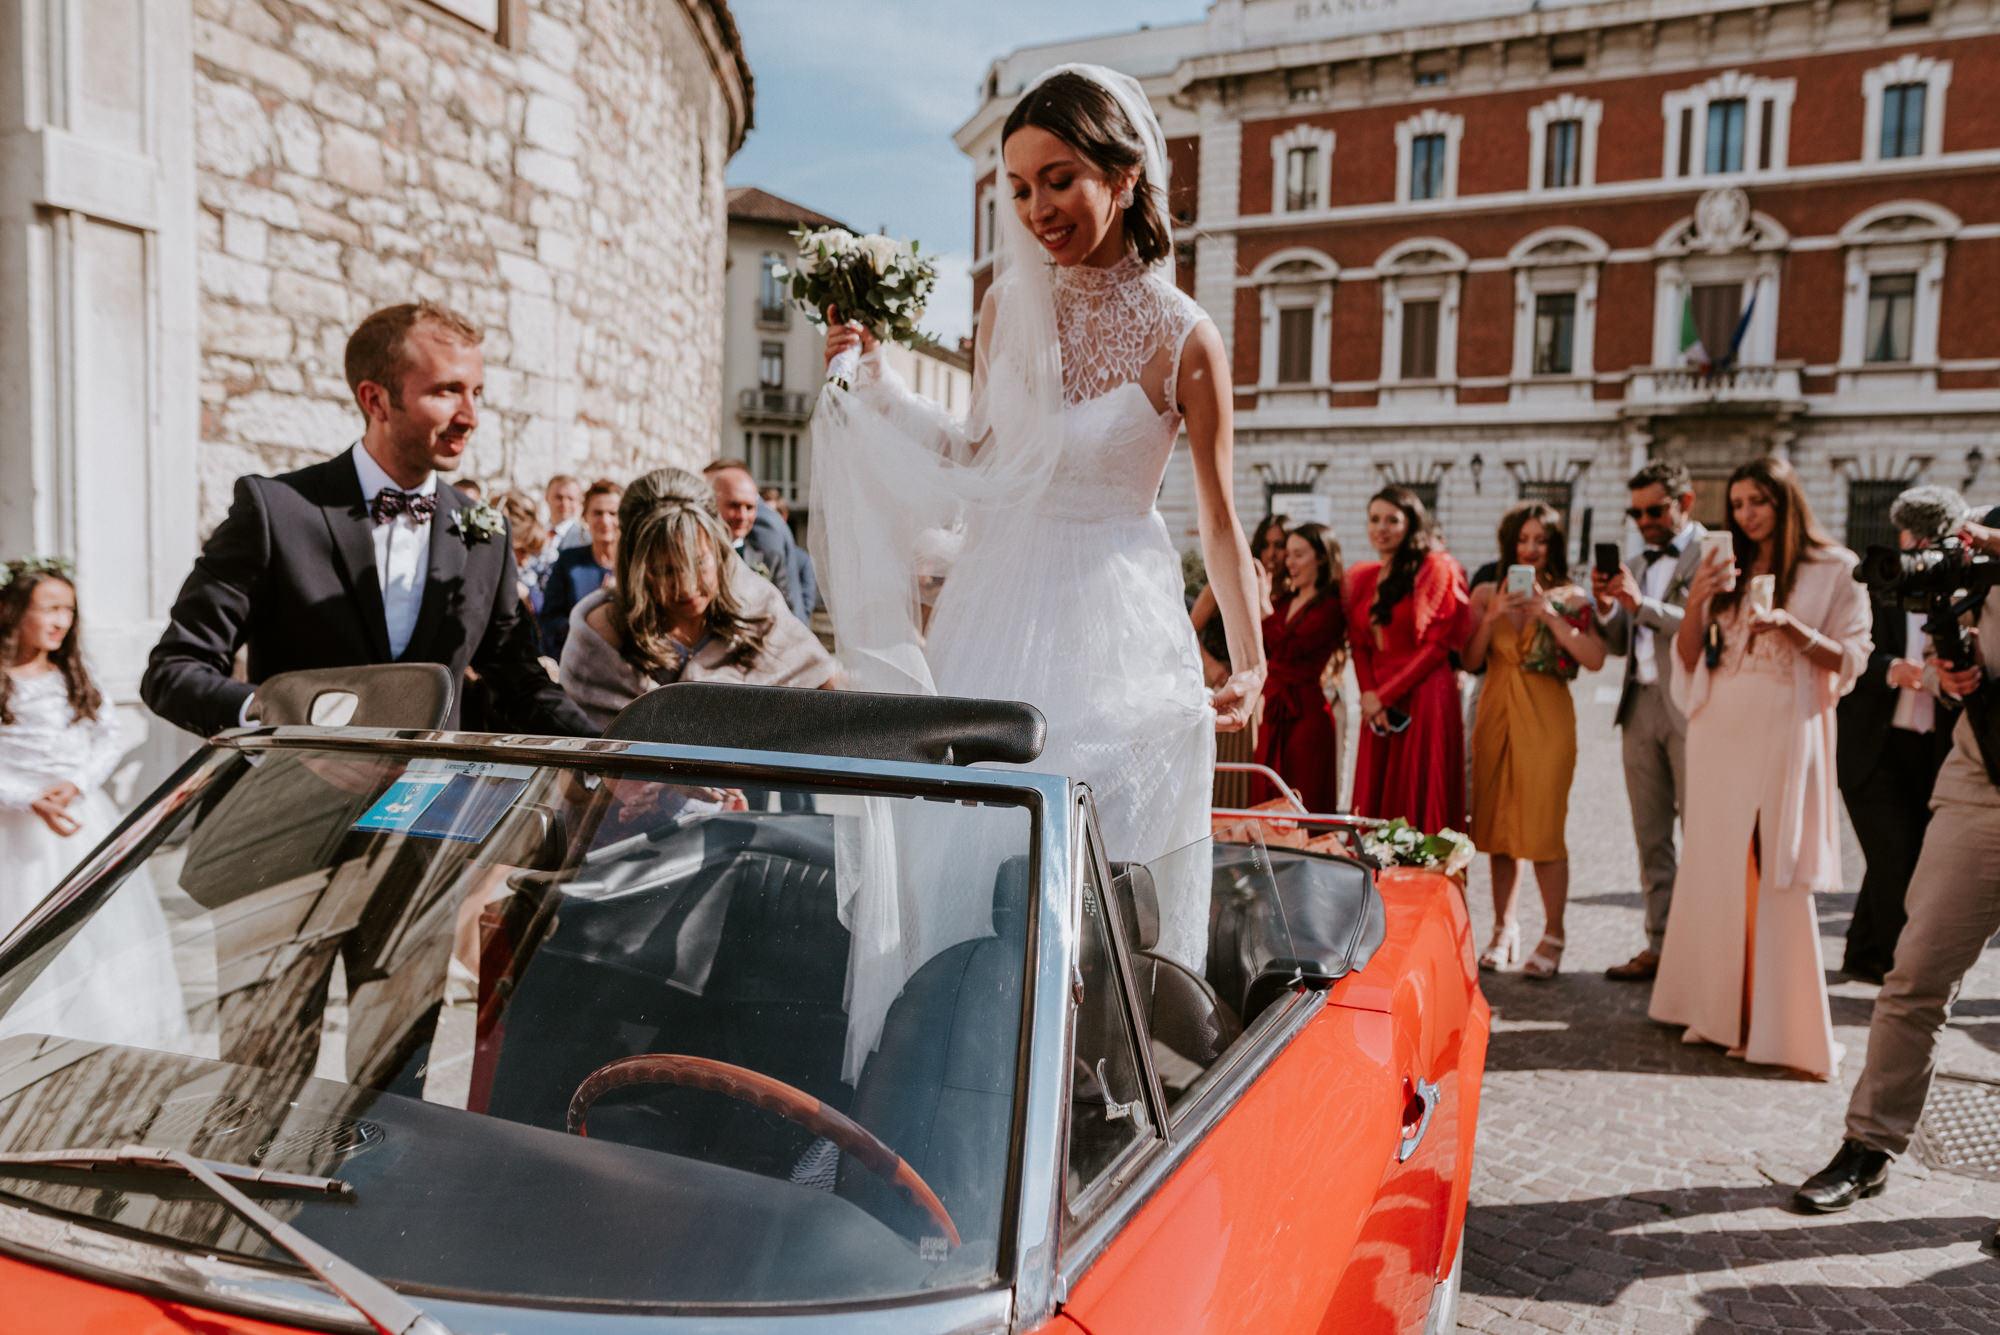 FOTO+PHOTO+BODA+WEDDING+ITALIA+ITALY+MAURICIO+GARAY+MAURICIOGARAY+WEDDINPHOTOGRAPHER+FOTOGRAFODEBODA-1074.jpg